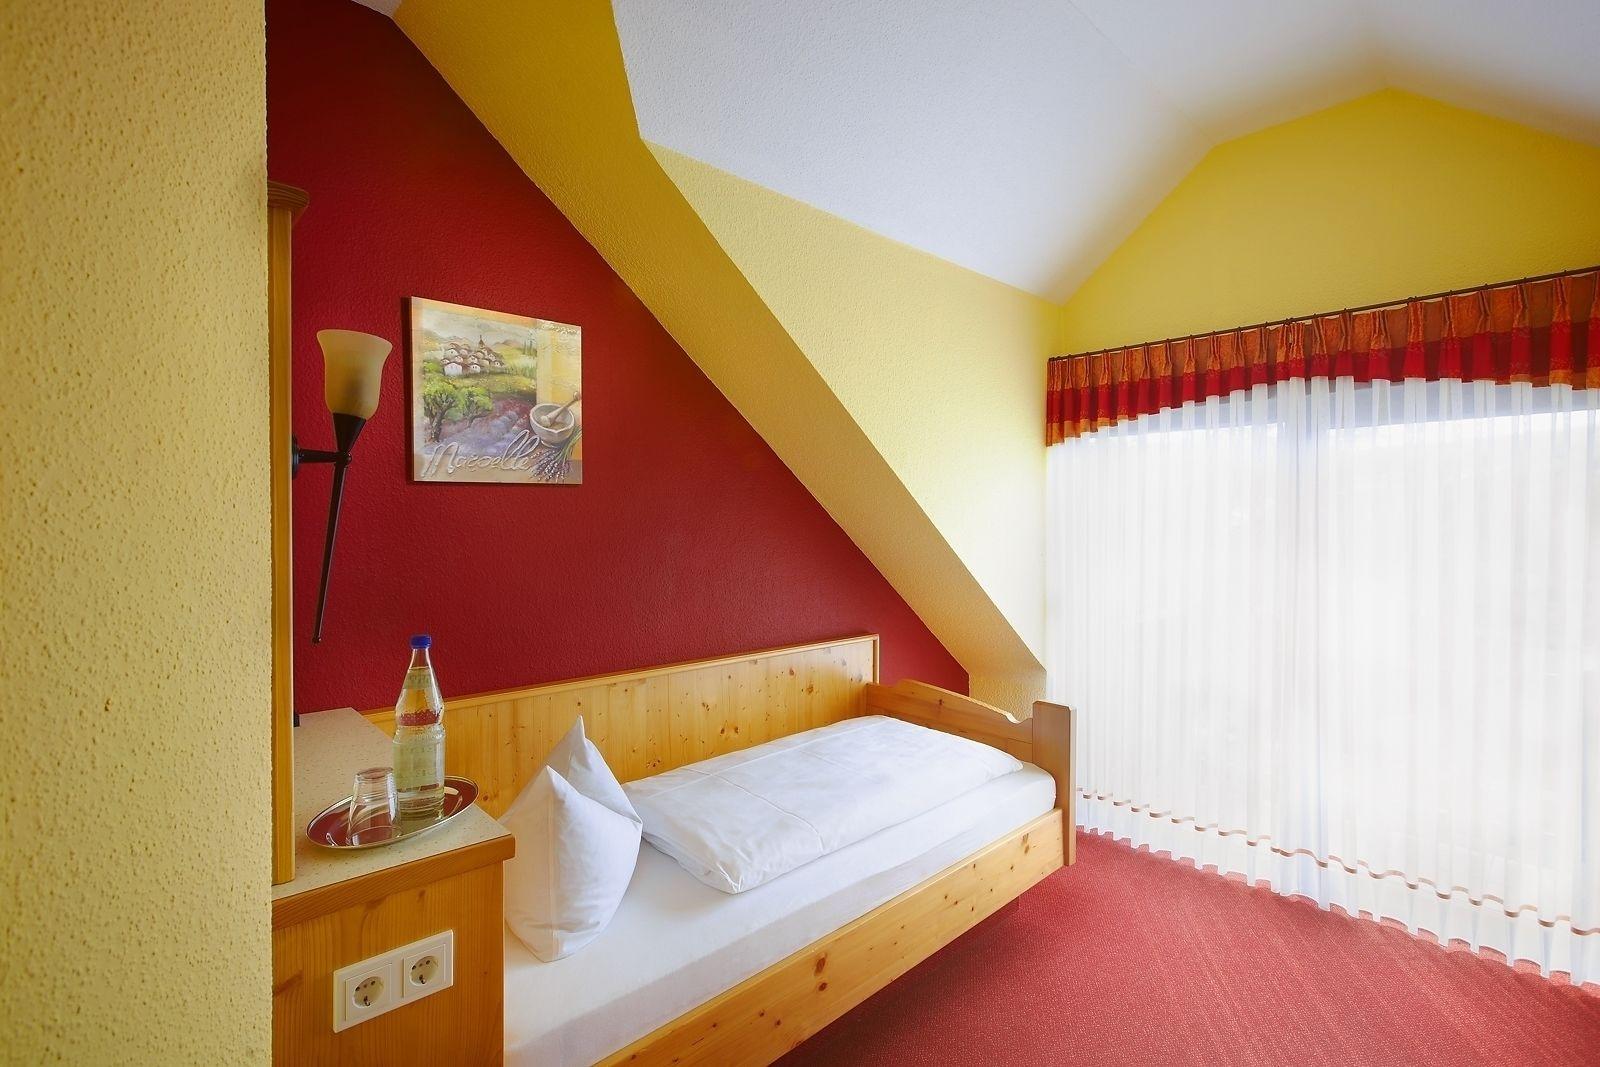 Landhotel & Waldgasthof Lembergblick, Bad Kreuznach